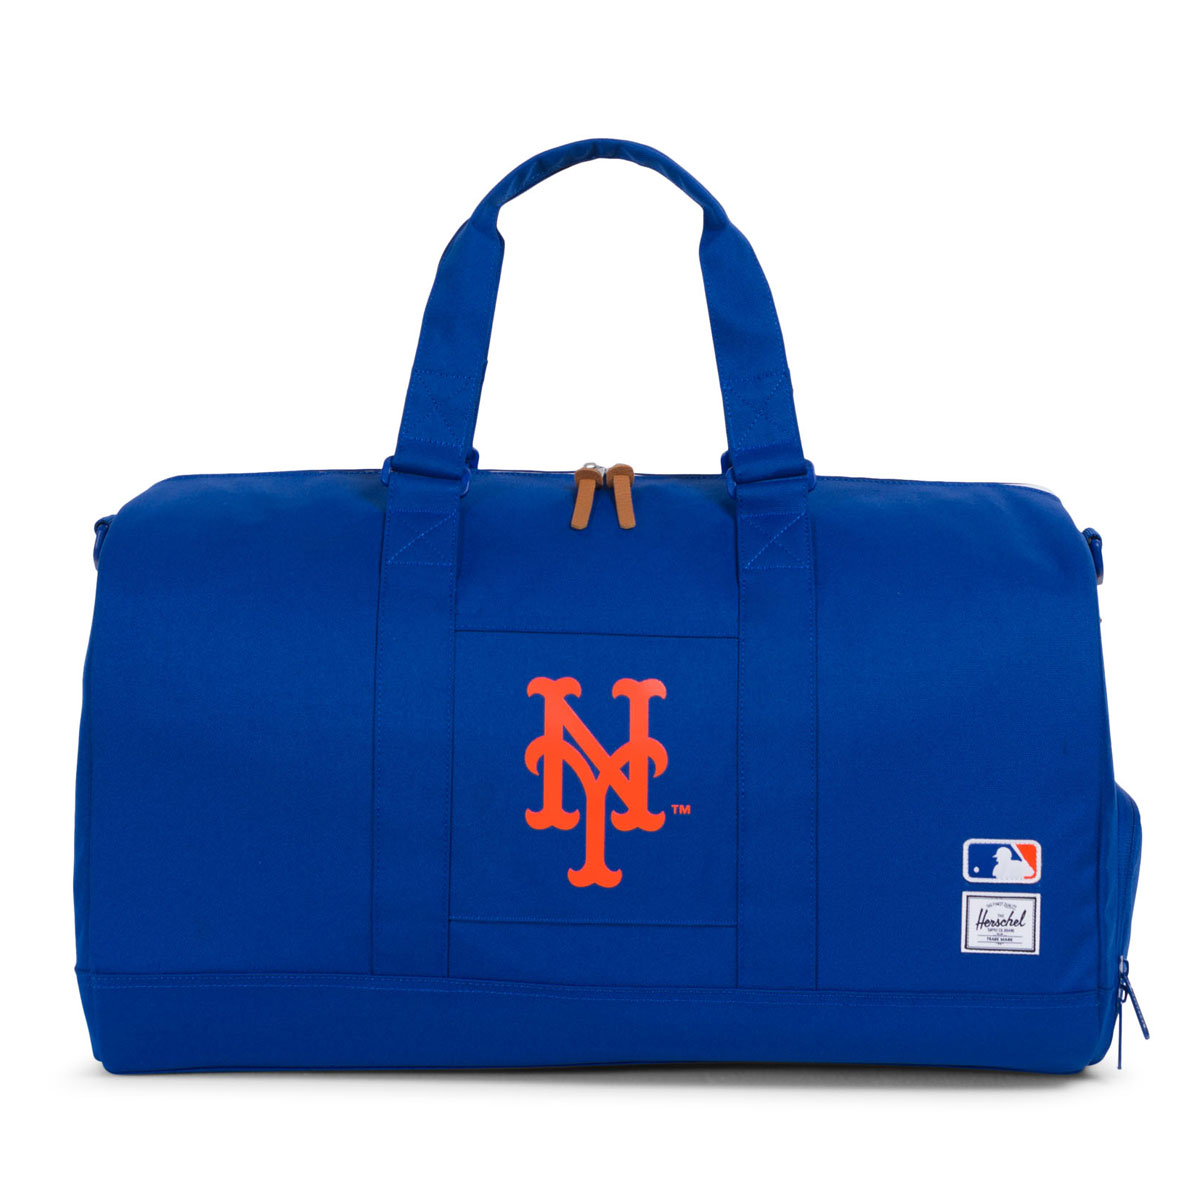 Herschel Supply Co NOVEL DUFFLE(ハーシェル サプライ ノベル ダッフル)New York Mets【メンズ レディース ダッフルバッグ】18SP-I